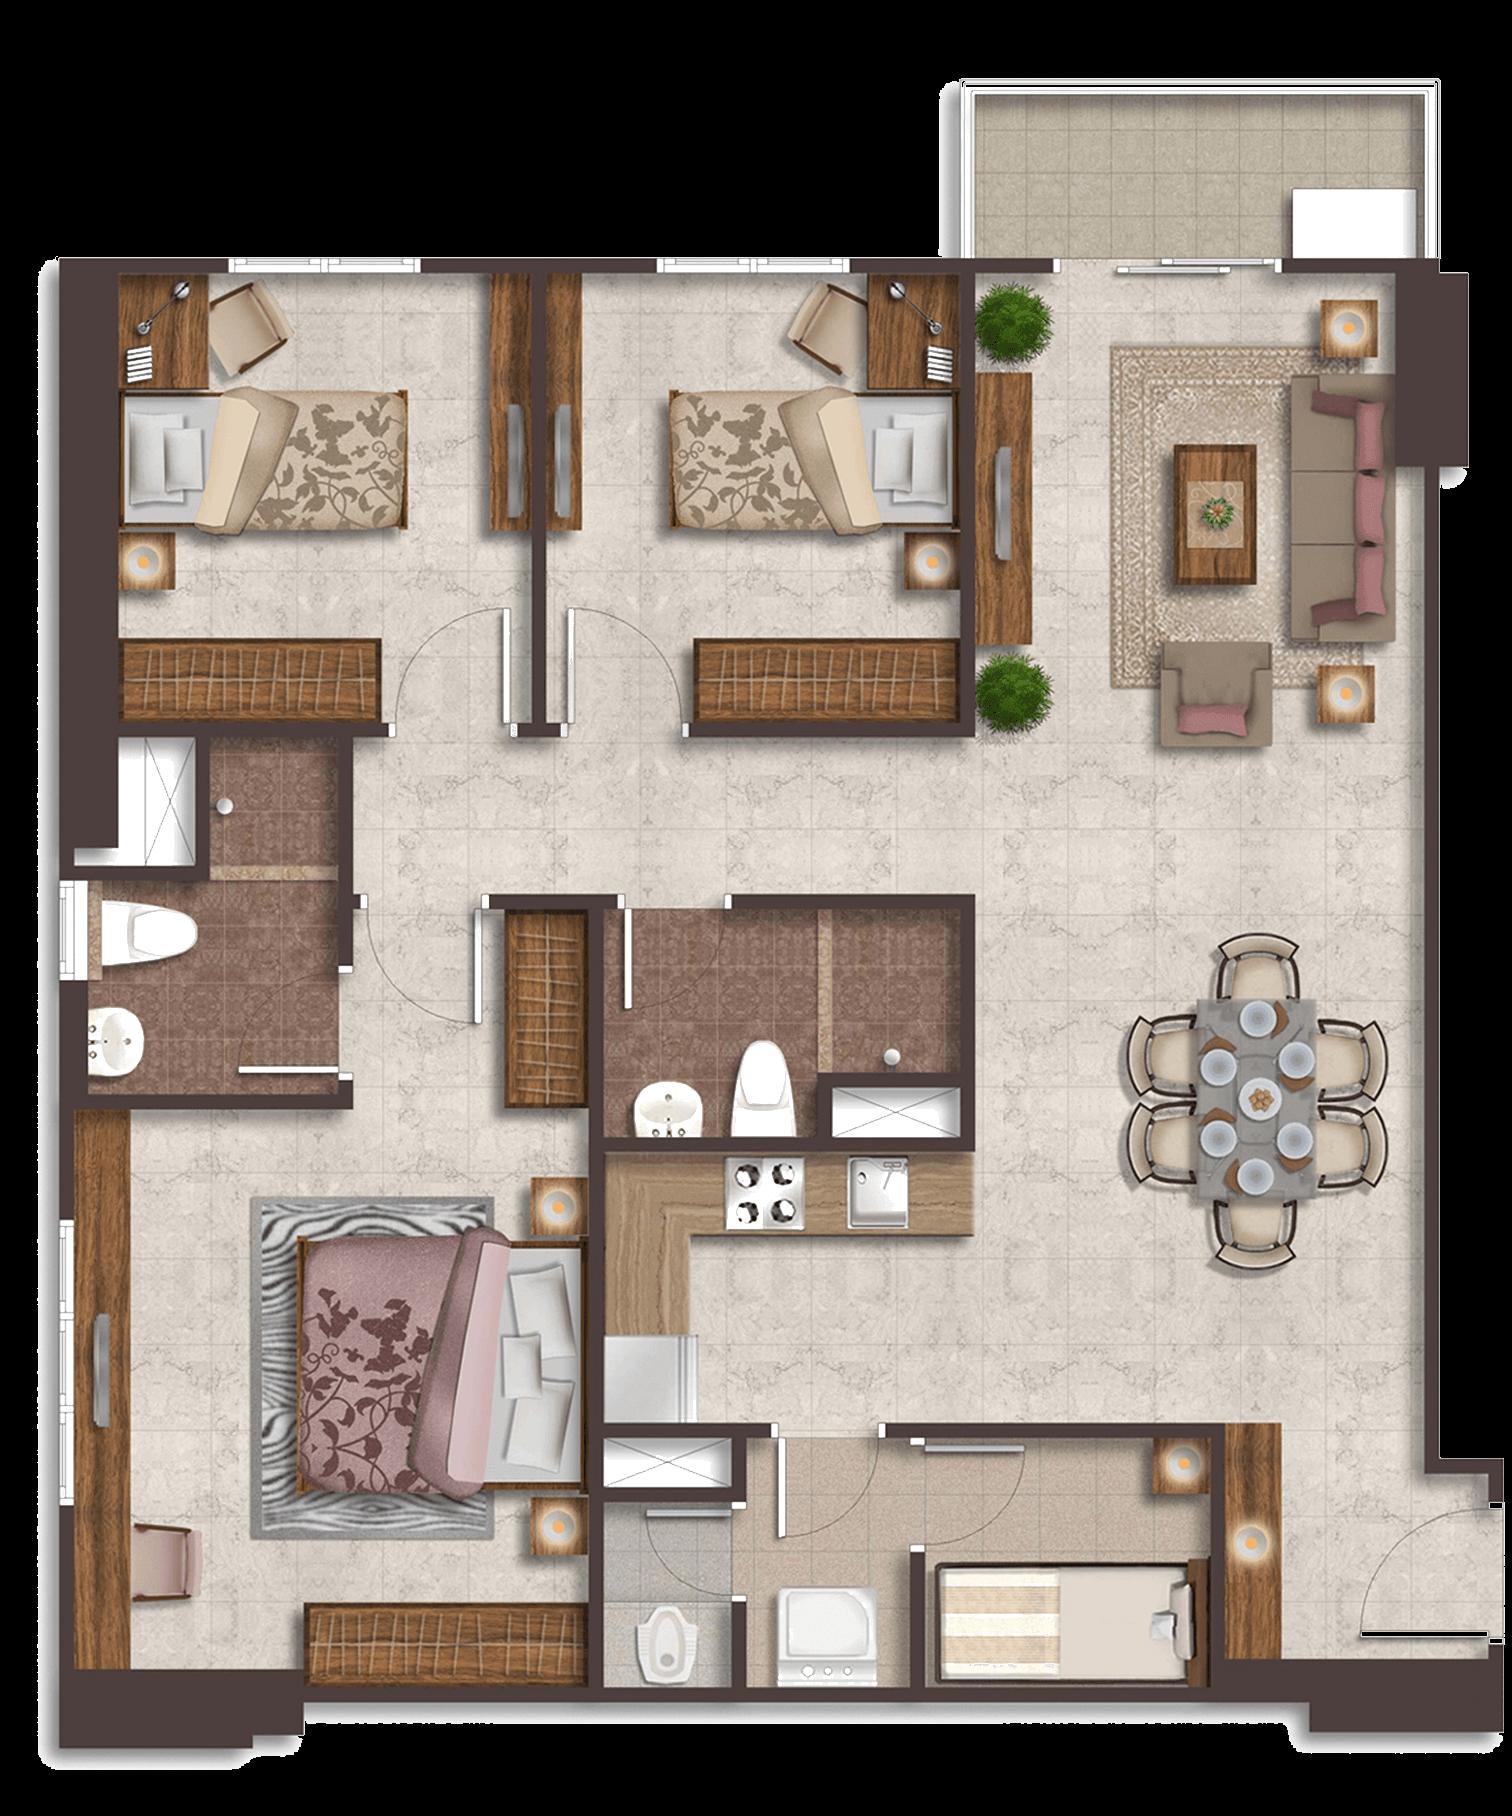 Podomoro City Deli Medan Luxurious Suite 3+1 Bedroom